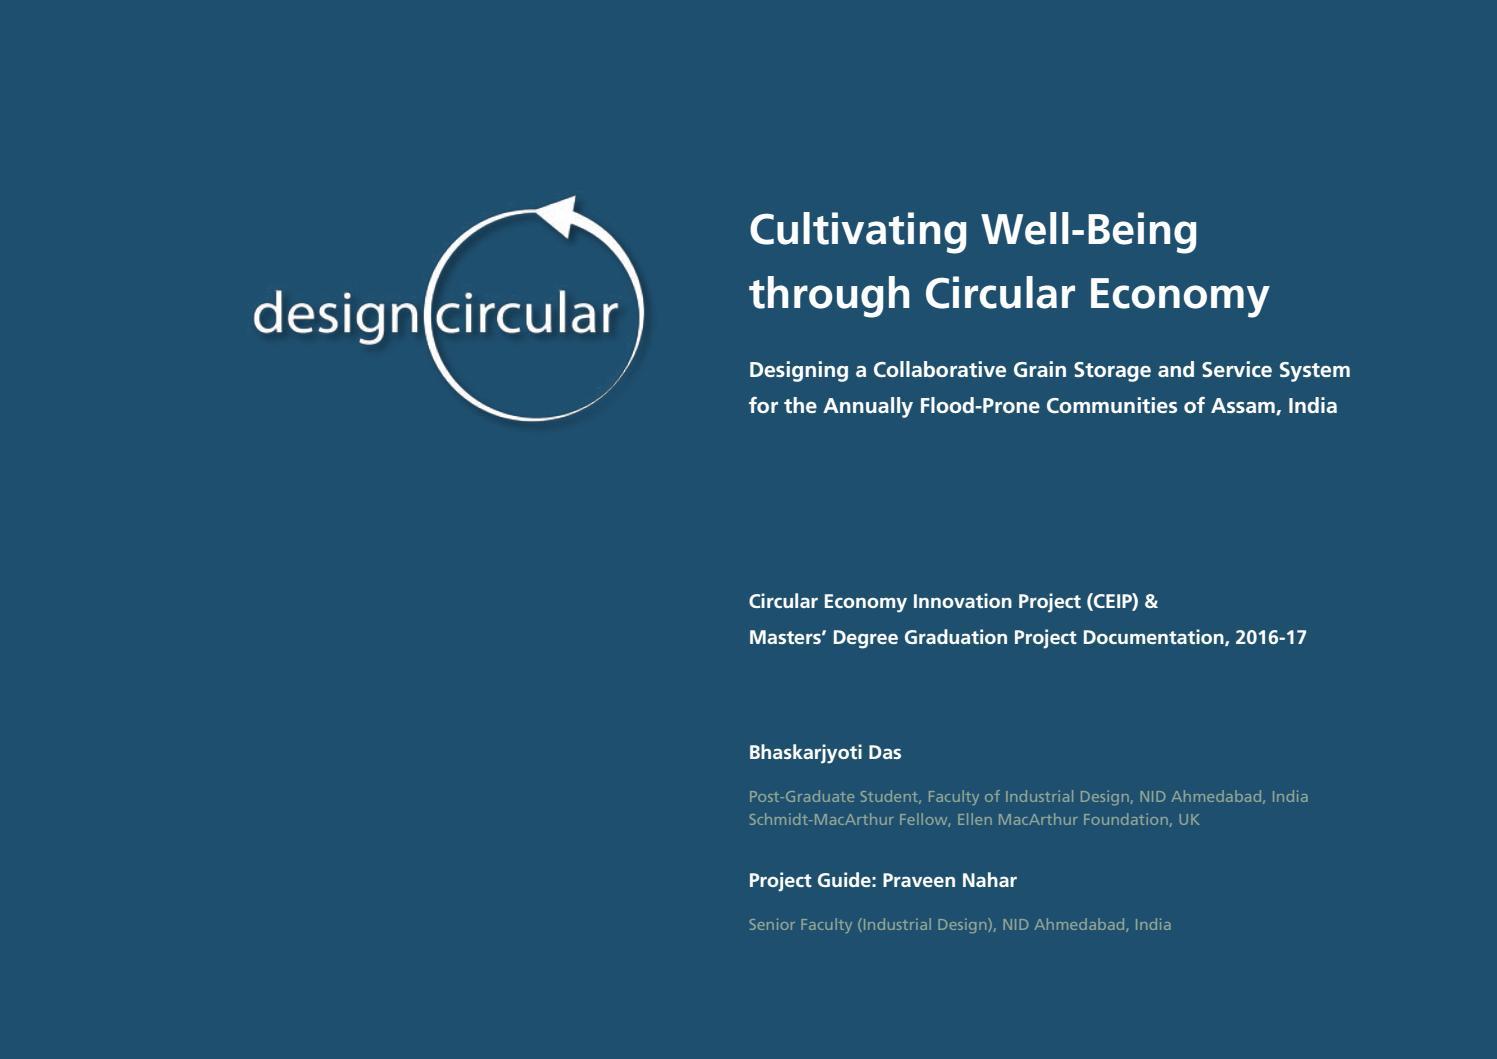 Cultivating well-being through circular economy by Bhaskarjyoti Das